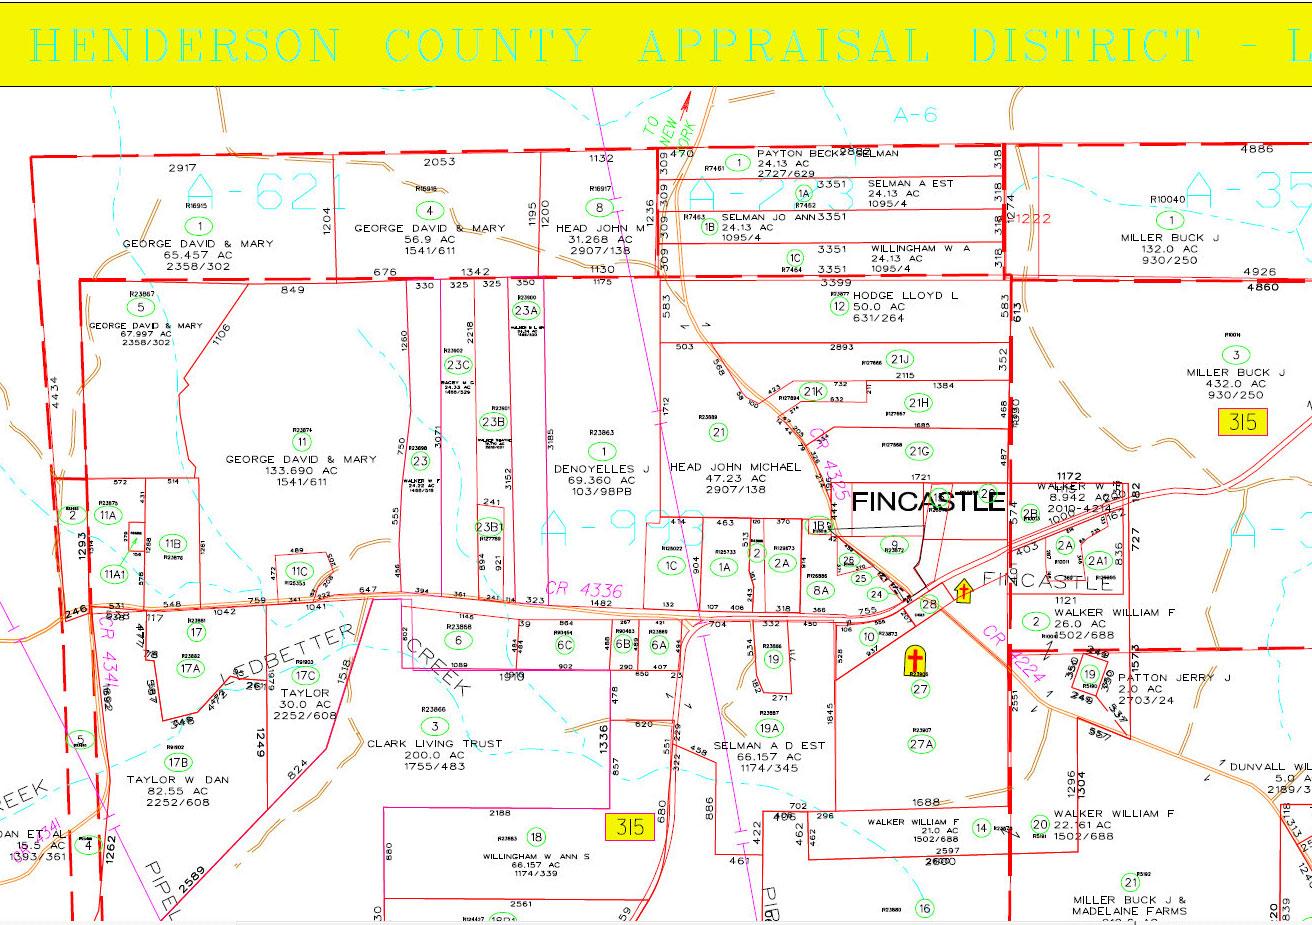 Grandad S Farm Locating Mclane Land In Henderson County Texas